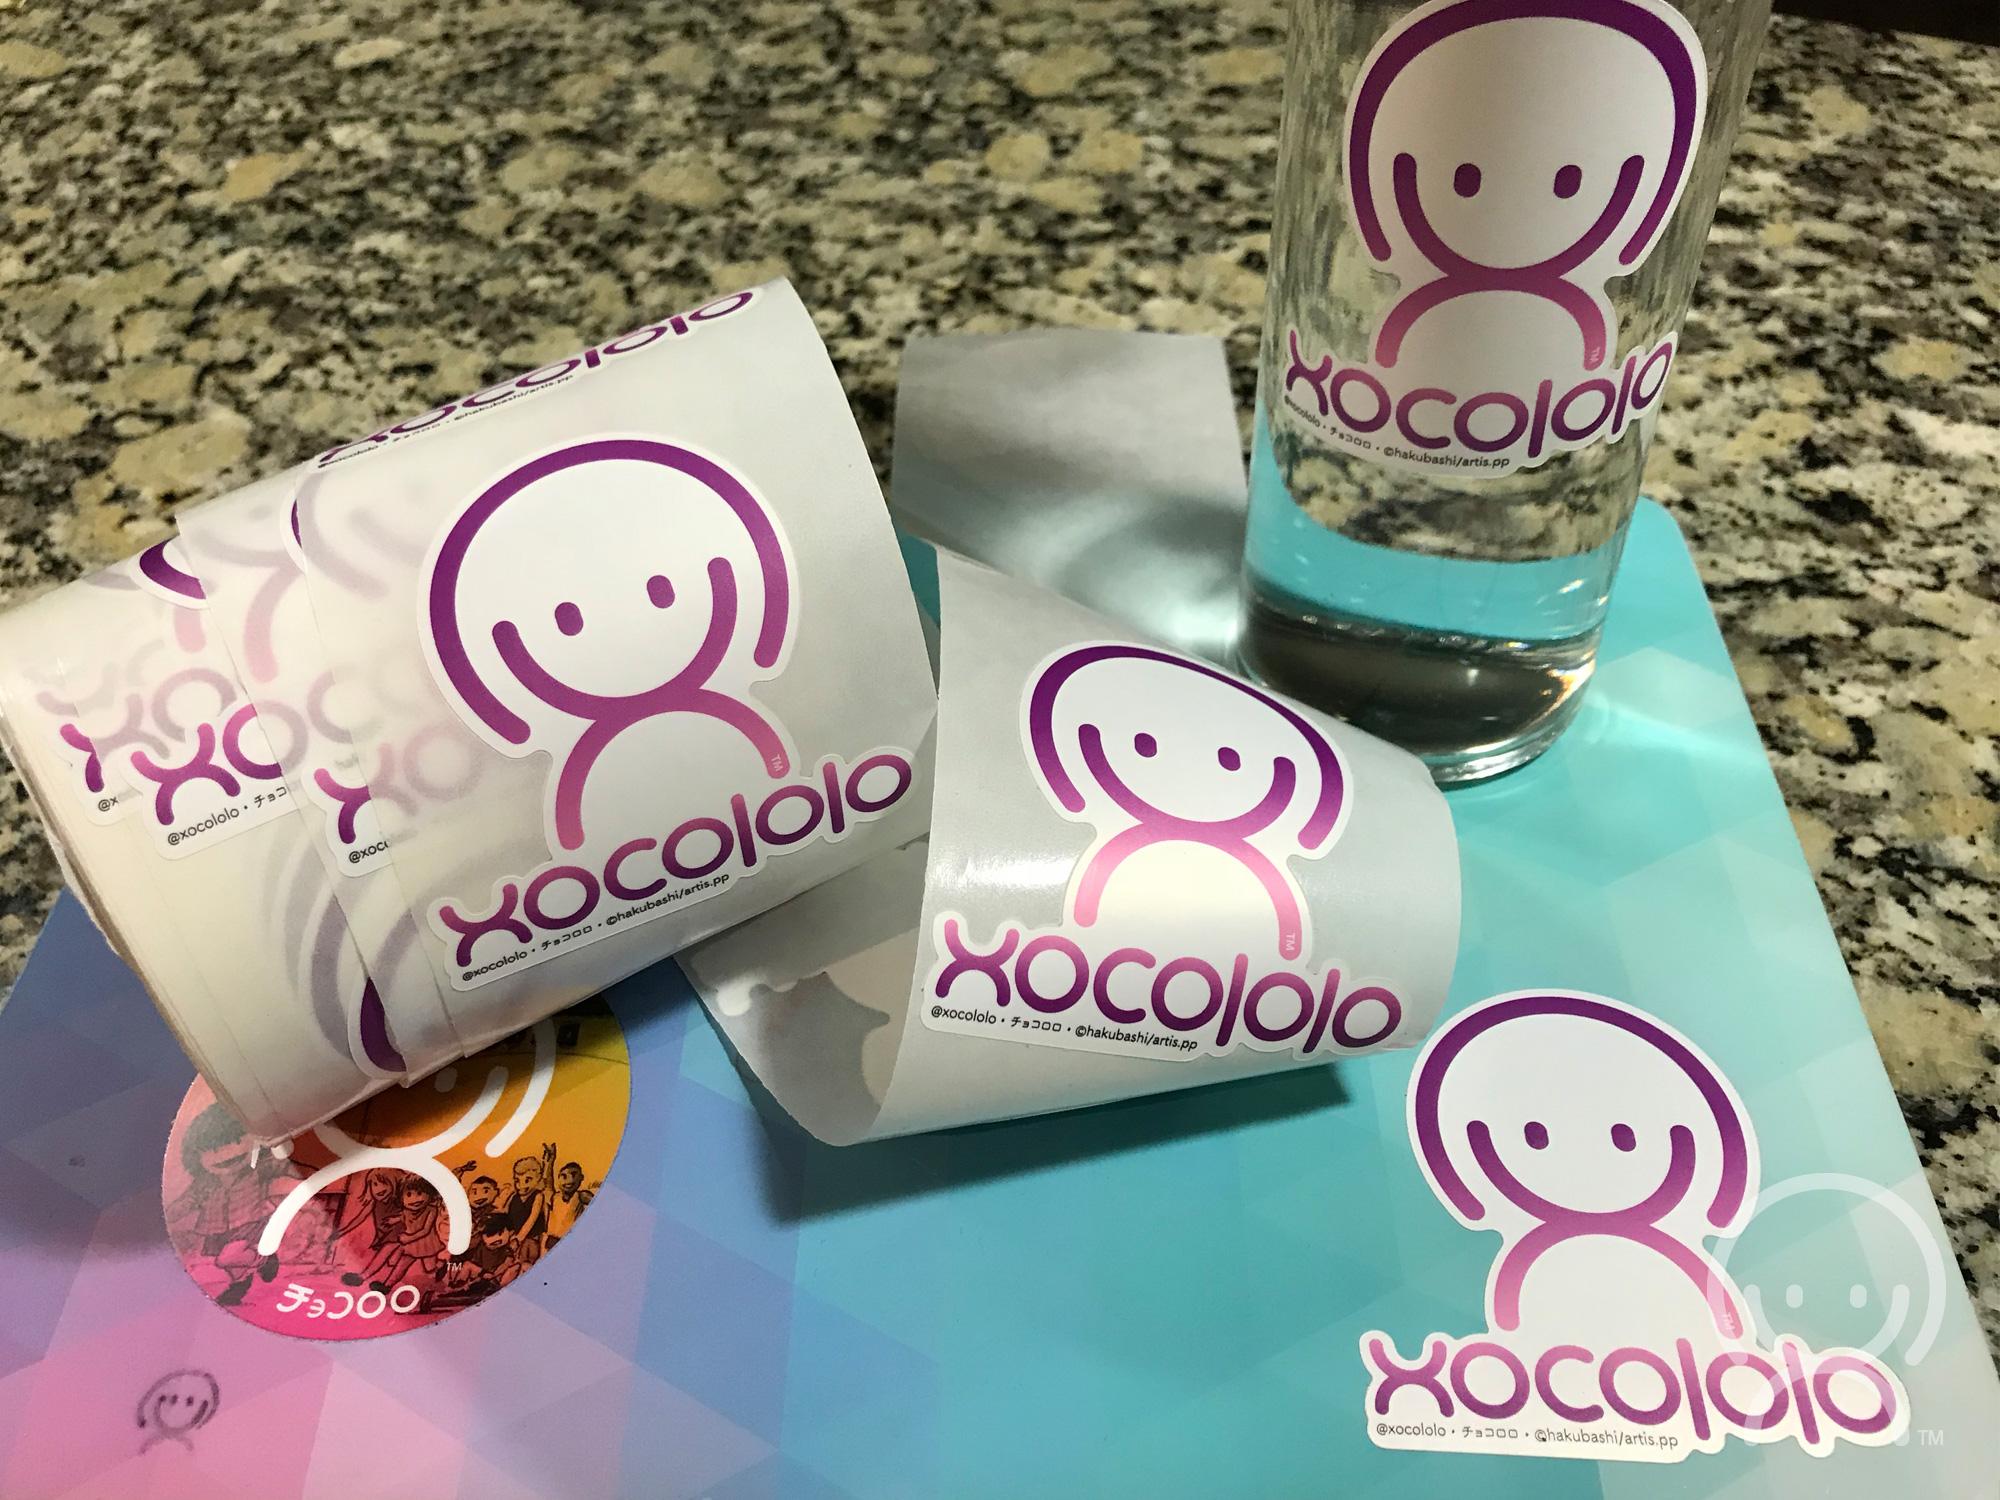 Xocololo stickers